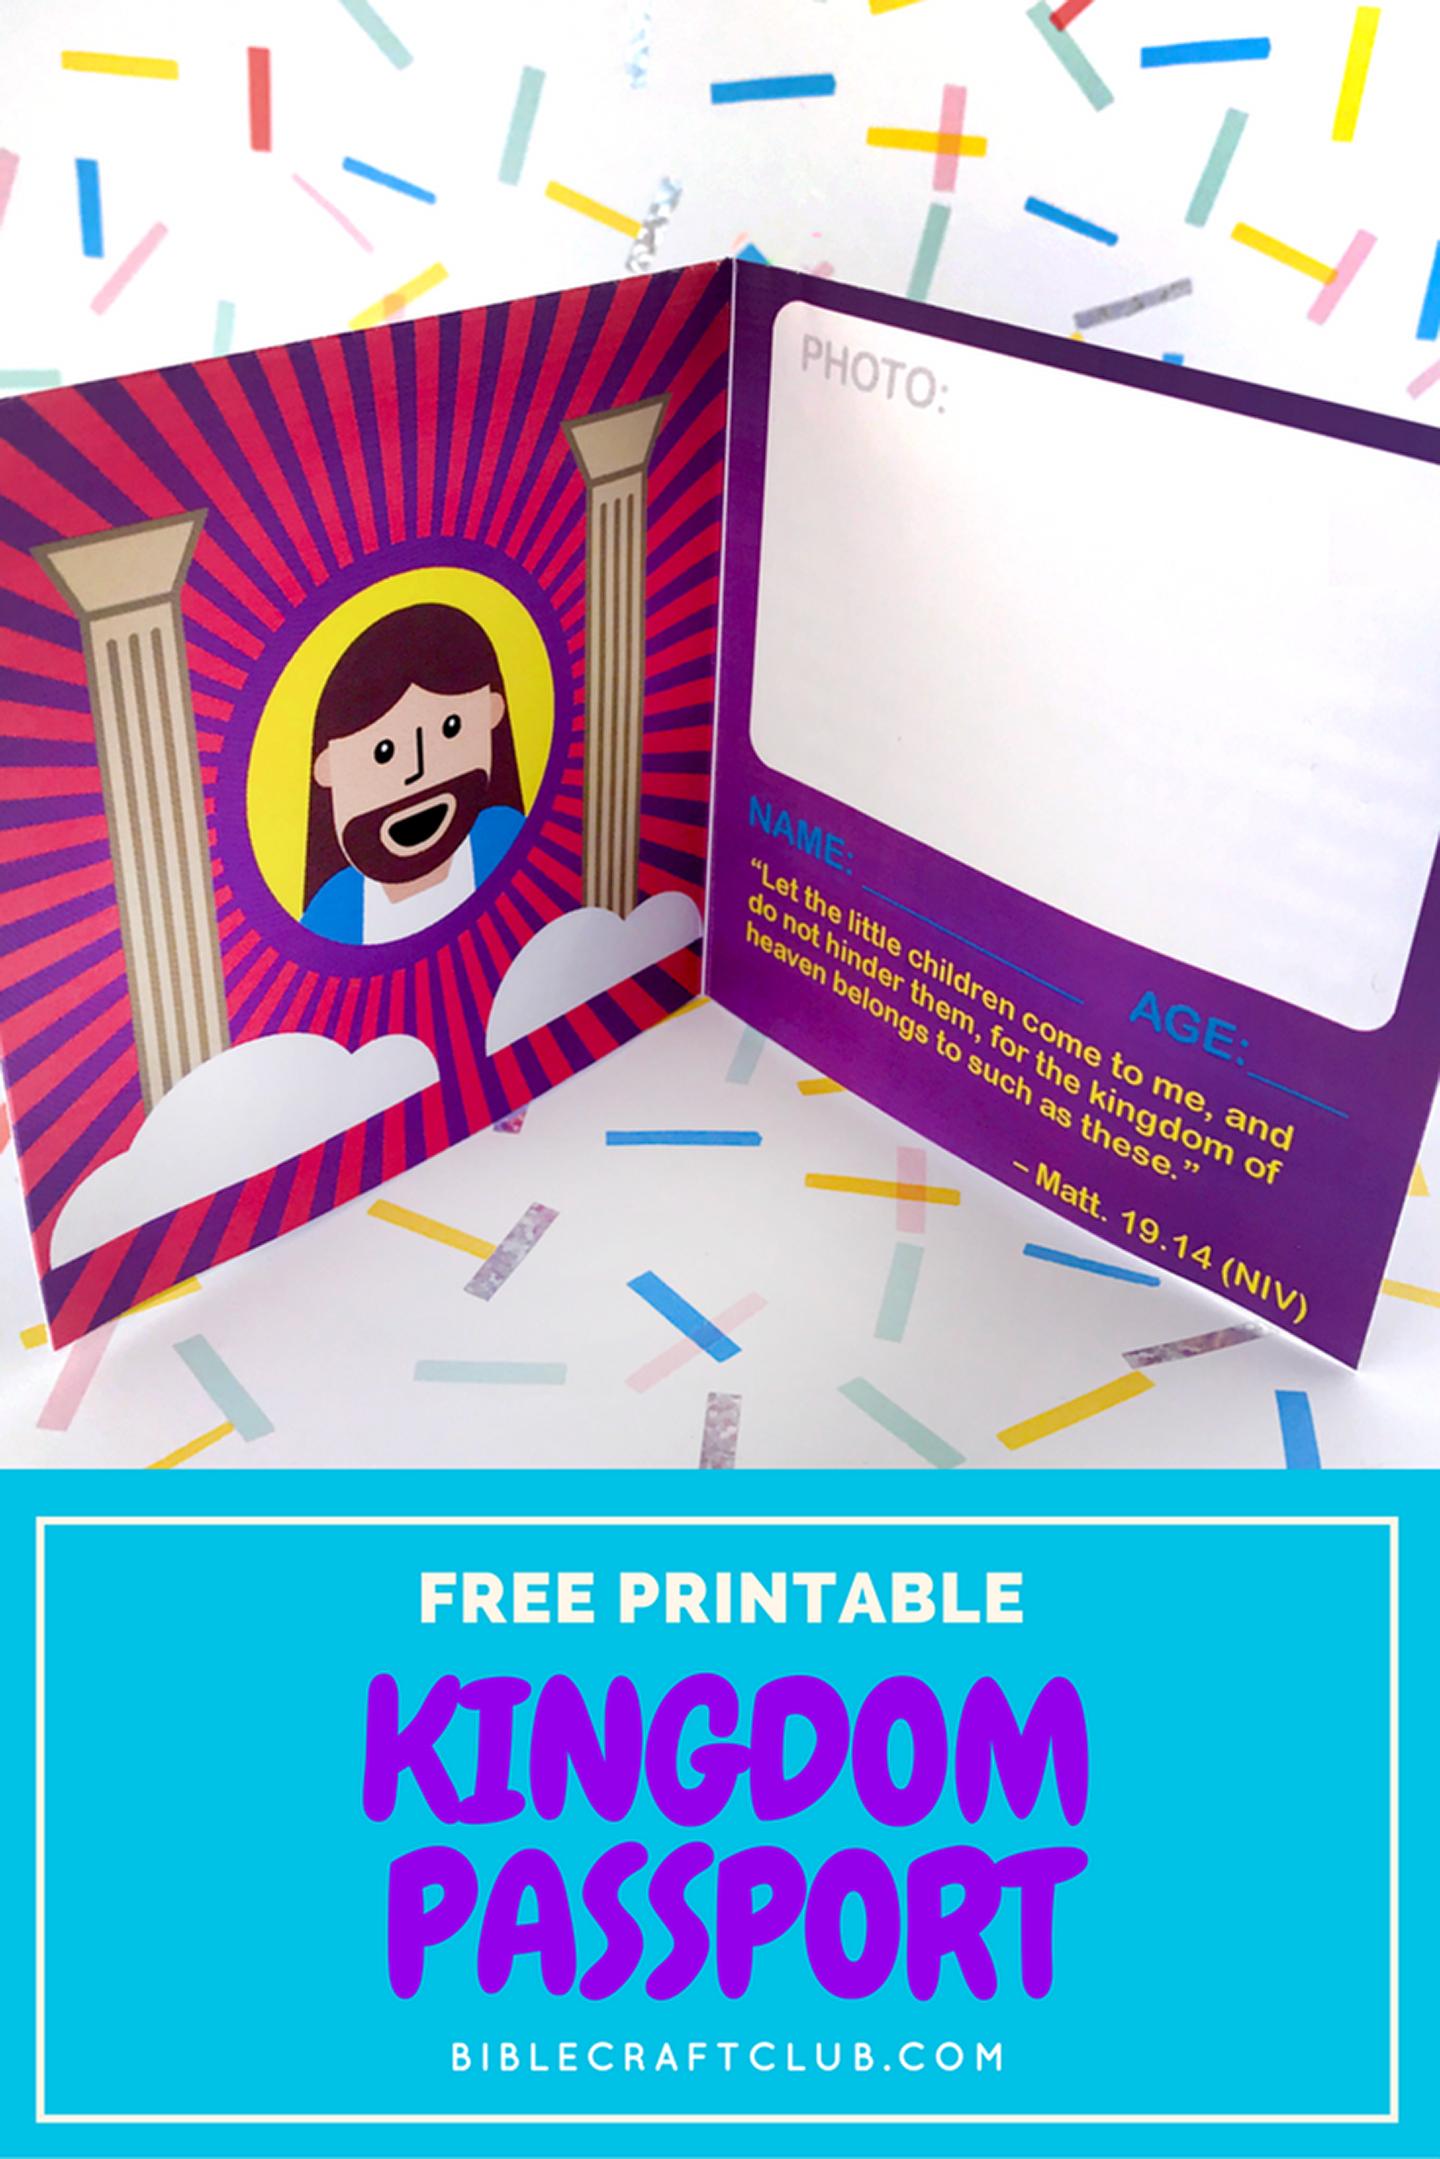 Kingdom Passport Craft | Biblecraftclub | Bible Crafts - Free Printable Bible Crafts